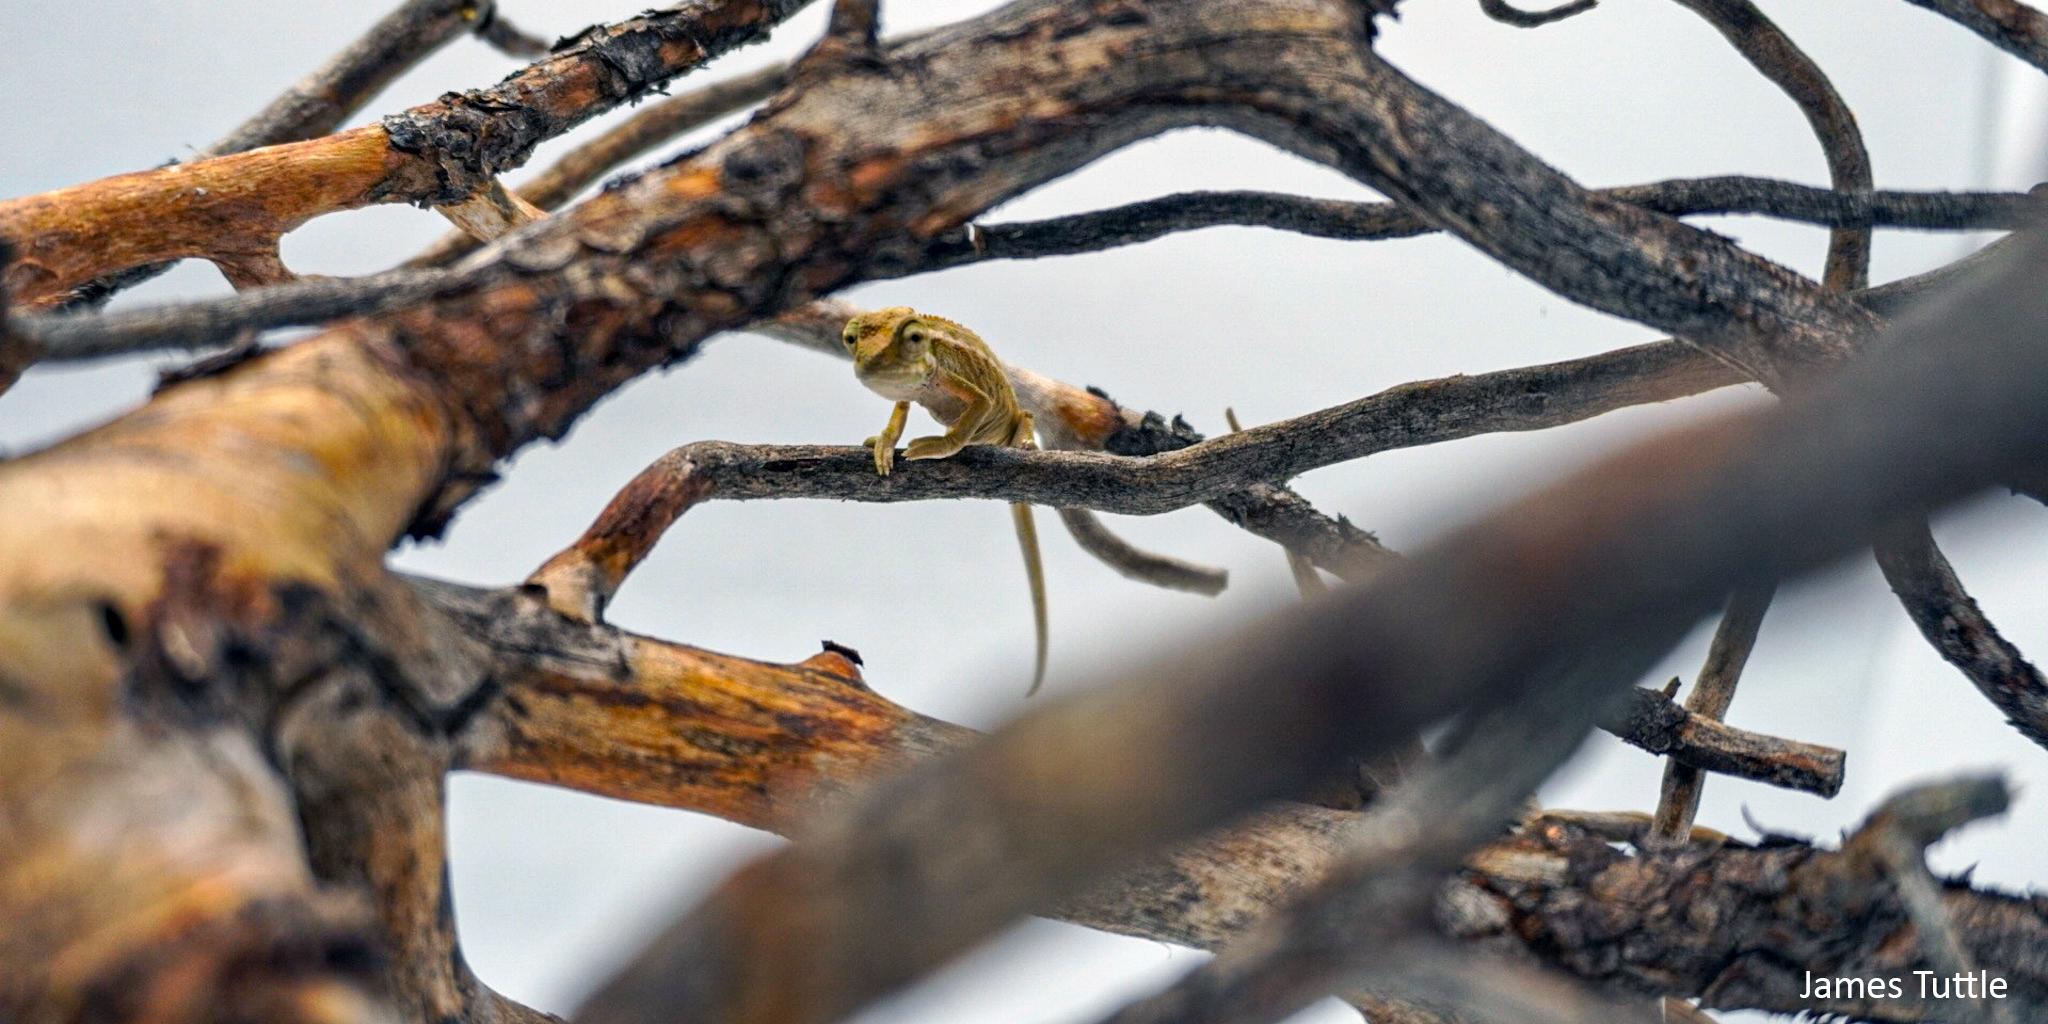 baby elliots chameleon